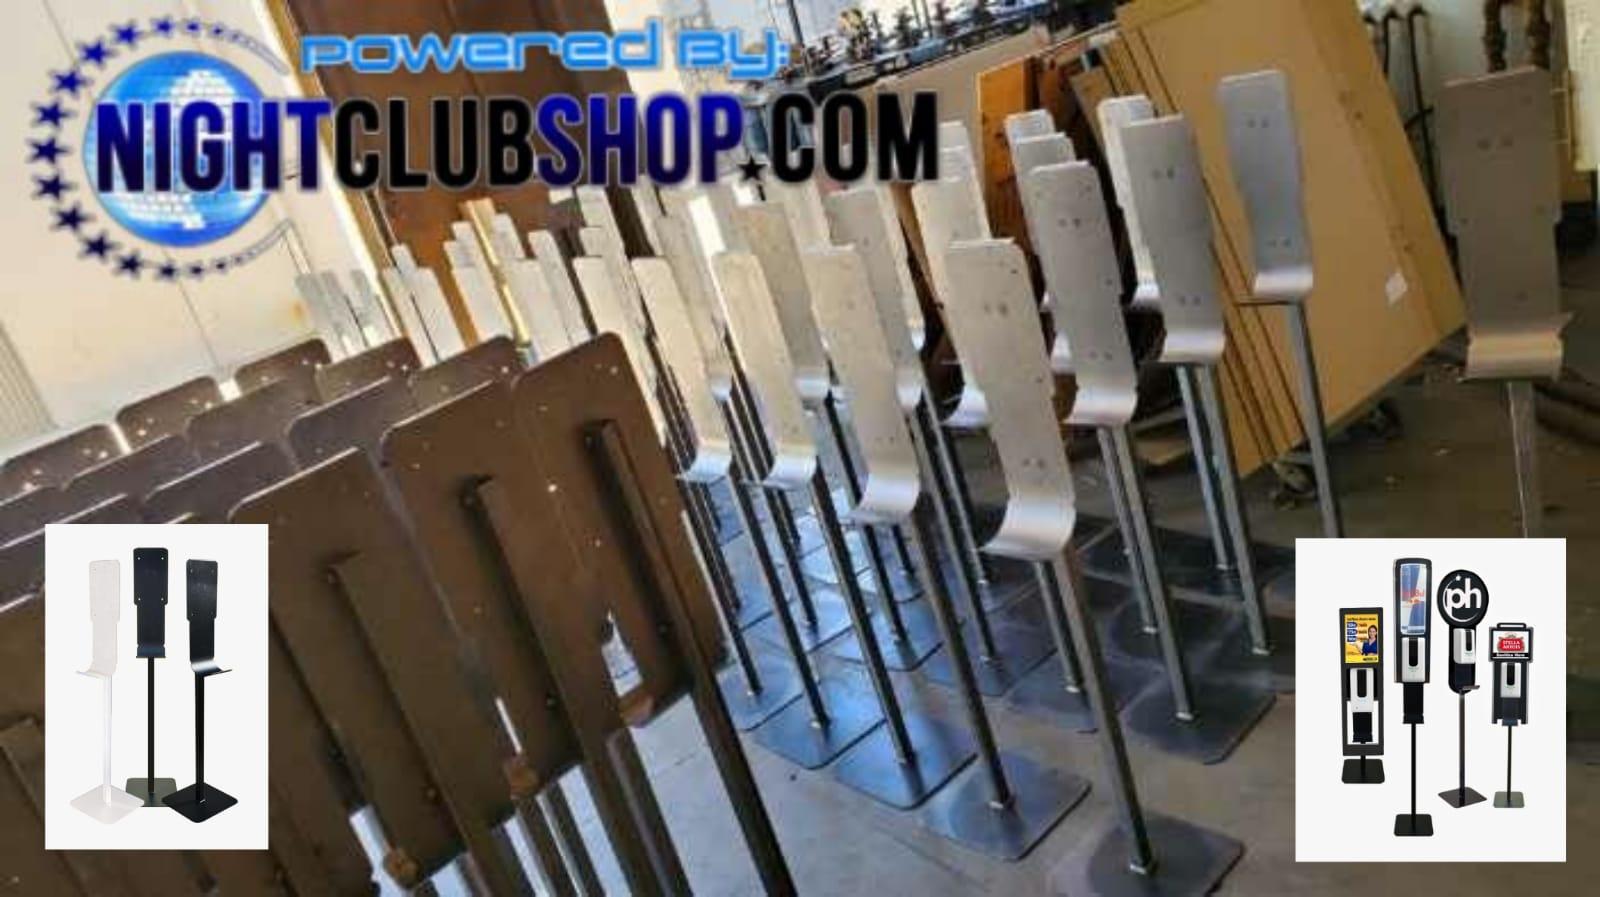 bulk-wholesale-manufacturer-custom-dispenser-stand-manufacturing-reseller-hand-sanitizer-dealer-pricing-discounted-ightclubshop-made-in-usa.jpg